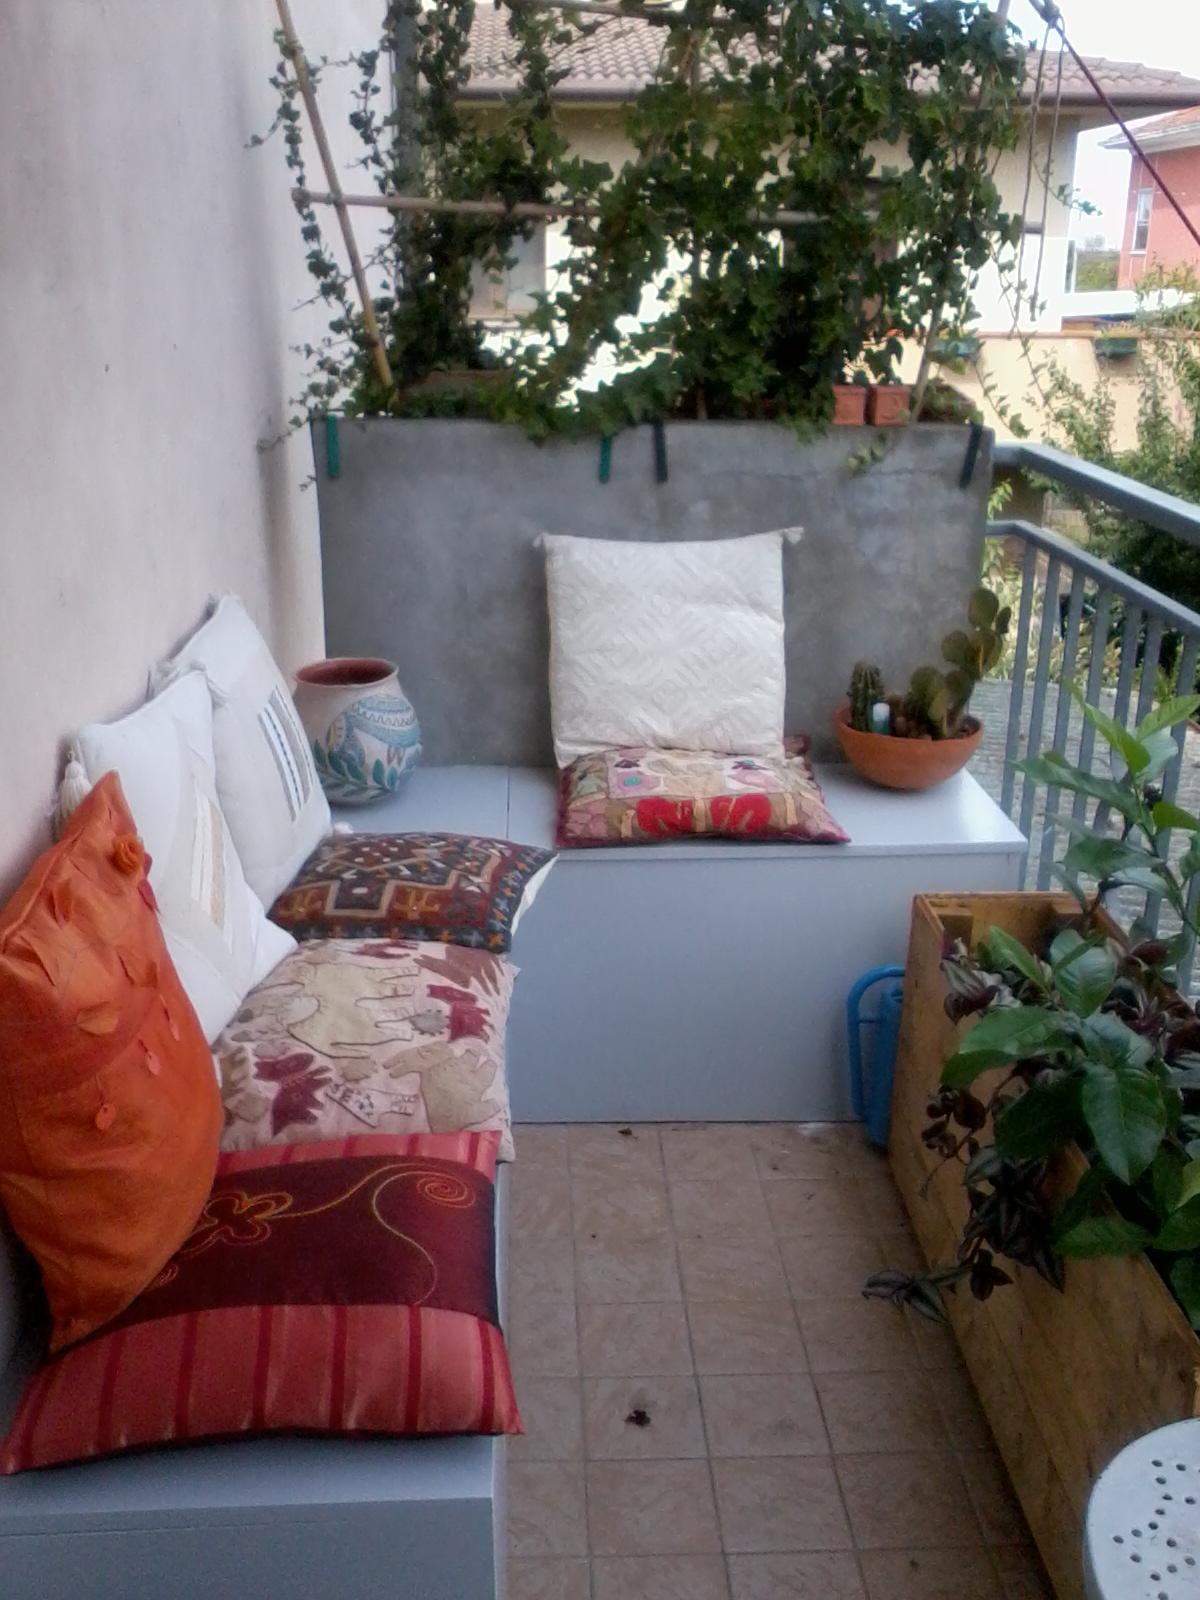 Dada paints her life una panca in terrazzo for Panca contenitore da terrazzo